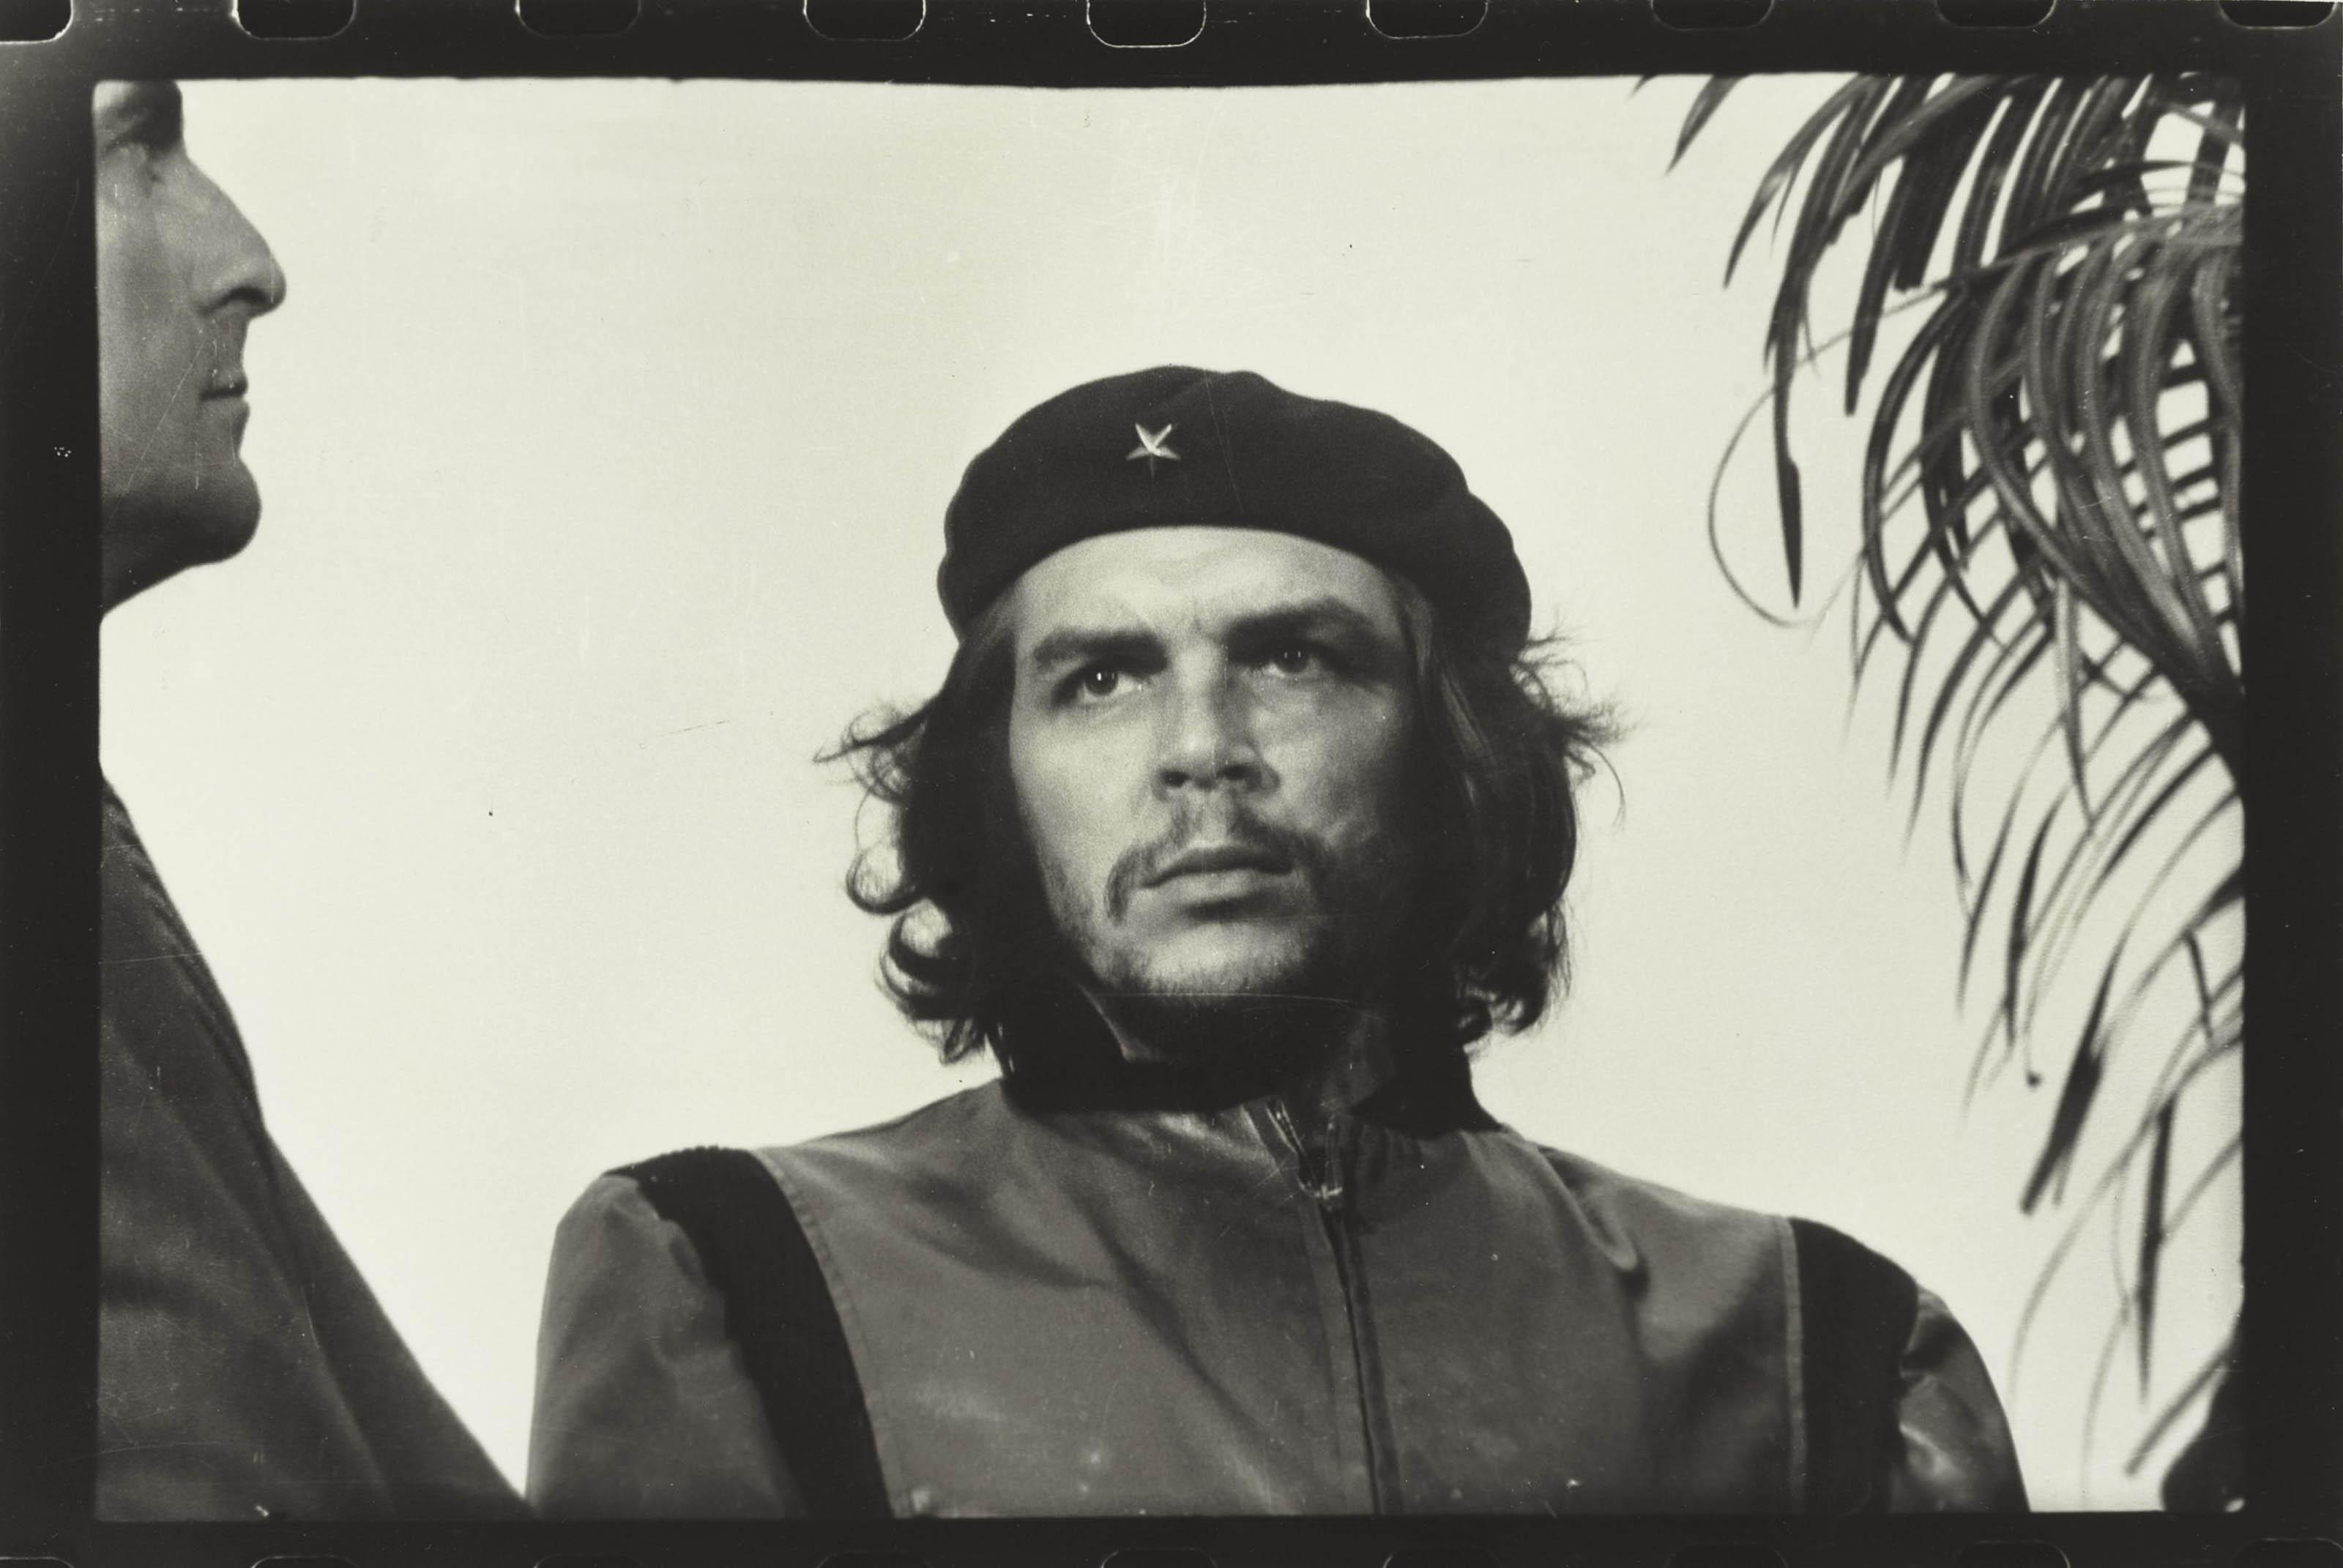 'Guerillero Heroico', Habana (Che Guevara), 1960